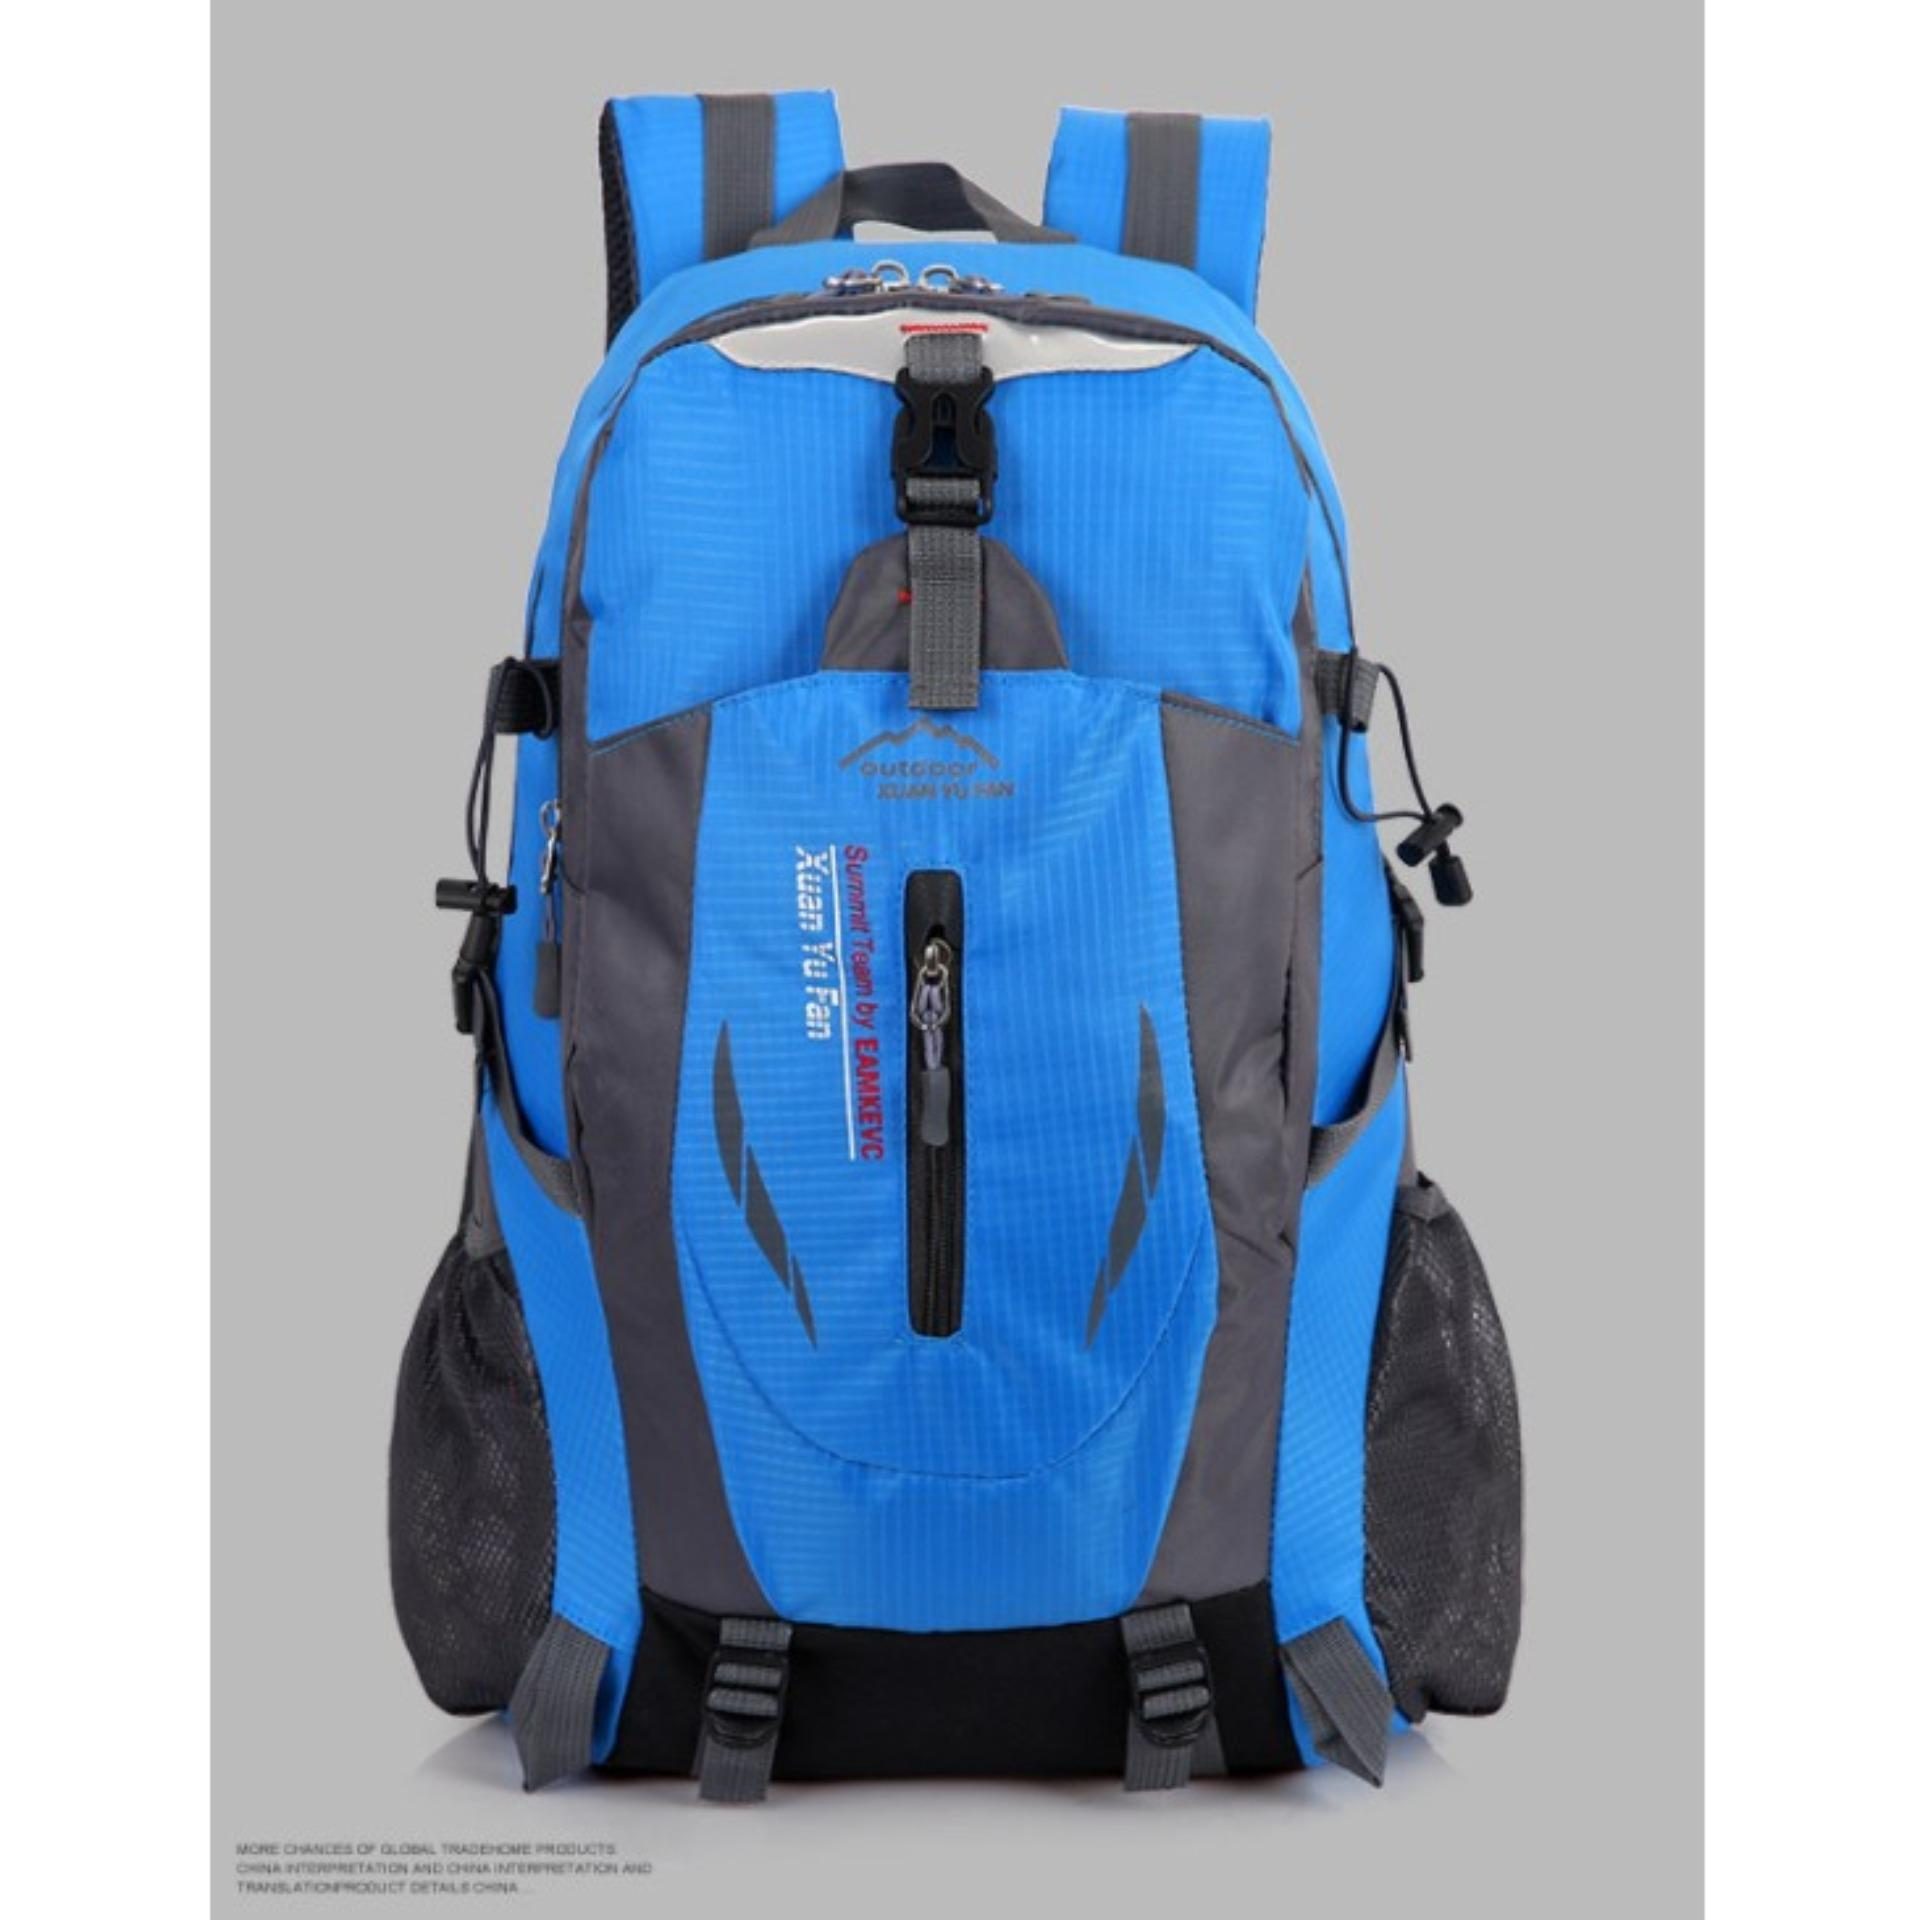 Unique Tas Ransel Backpack Hiking Outdoor Camping Knight Blue Free Adda Home Untuk